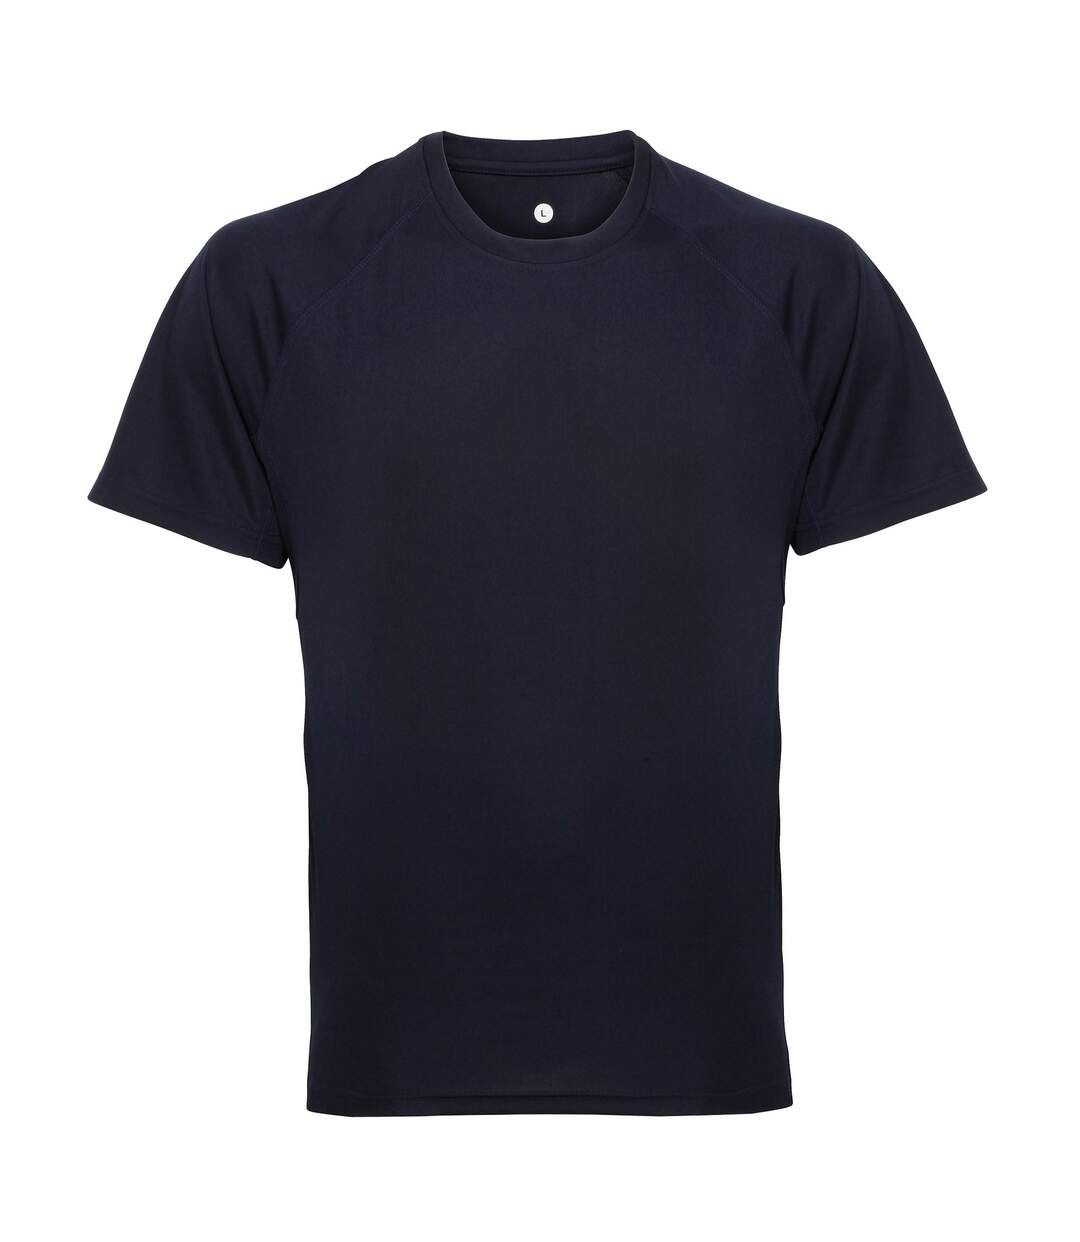 Tri Dri Mens Panelled Short Sleeve T-Shirt (French Navy) - UTRW4799